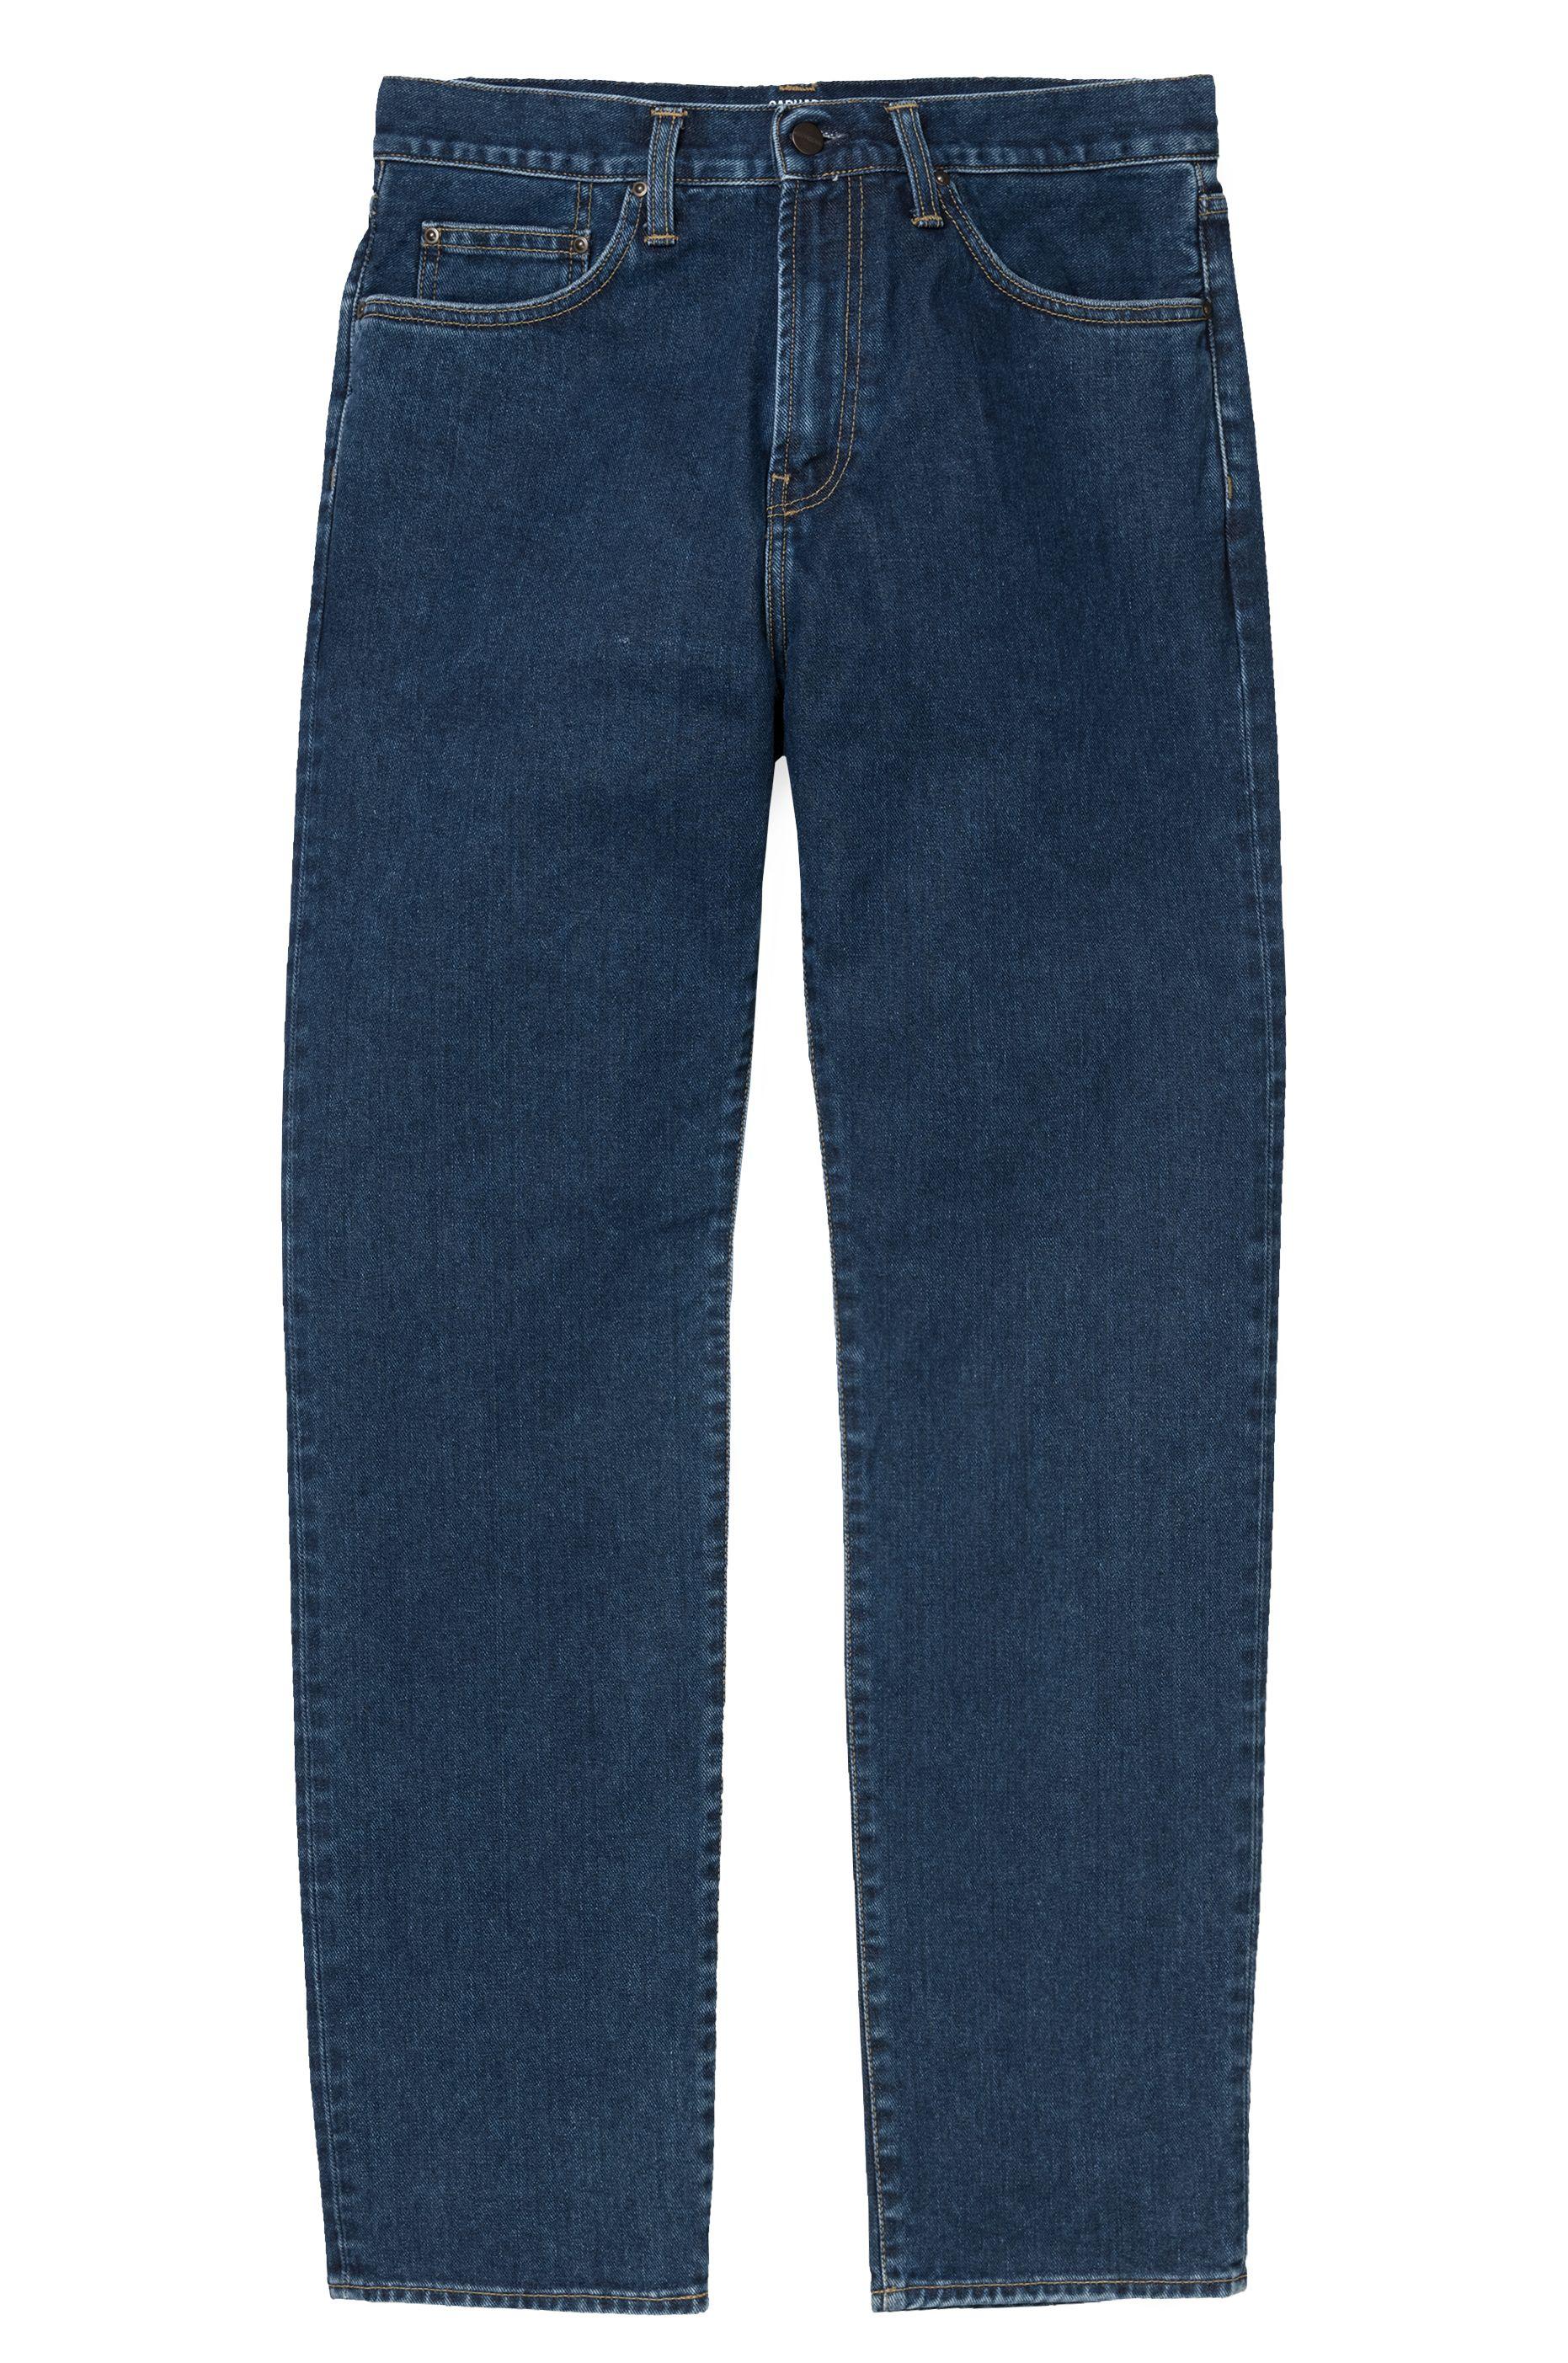 Carhartt WIP Pant Jeans PONTIAC Blue Stone Washed